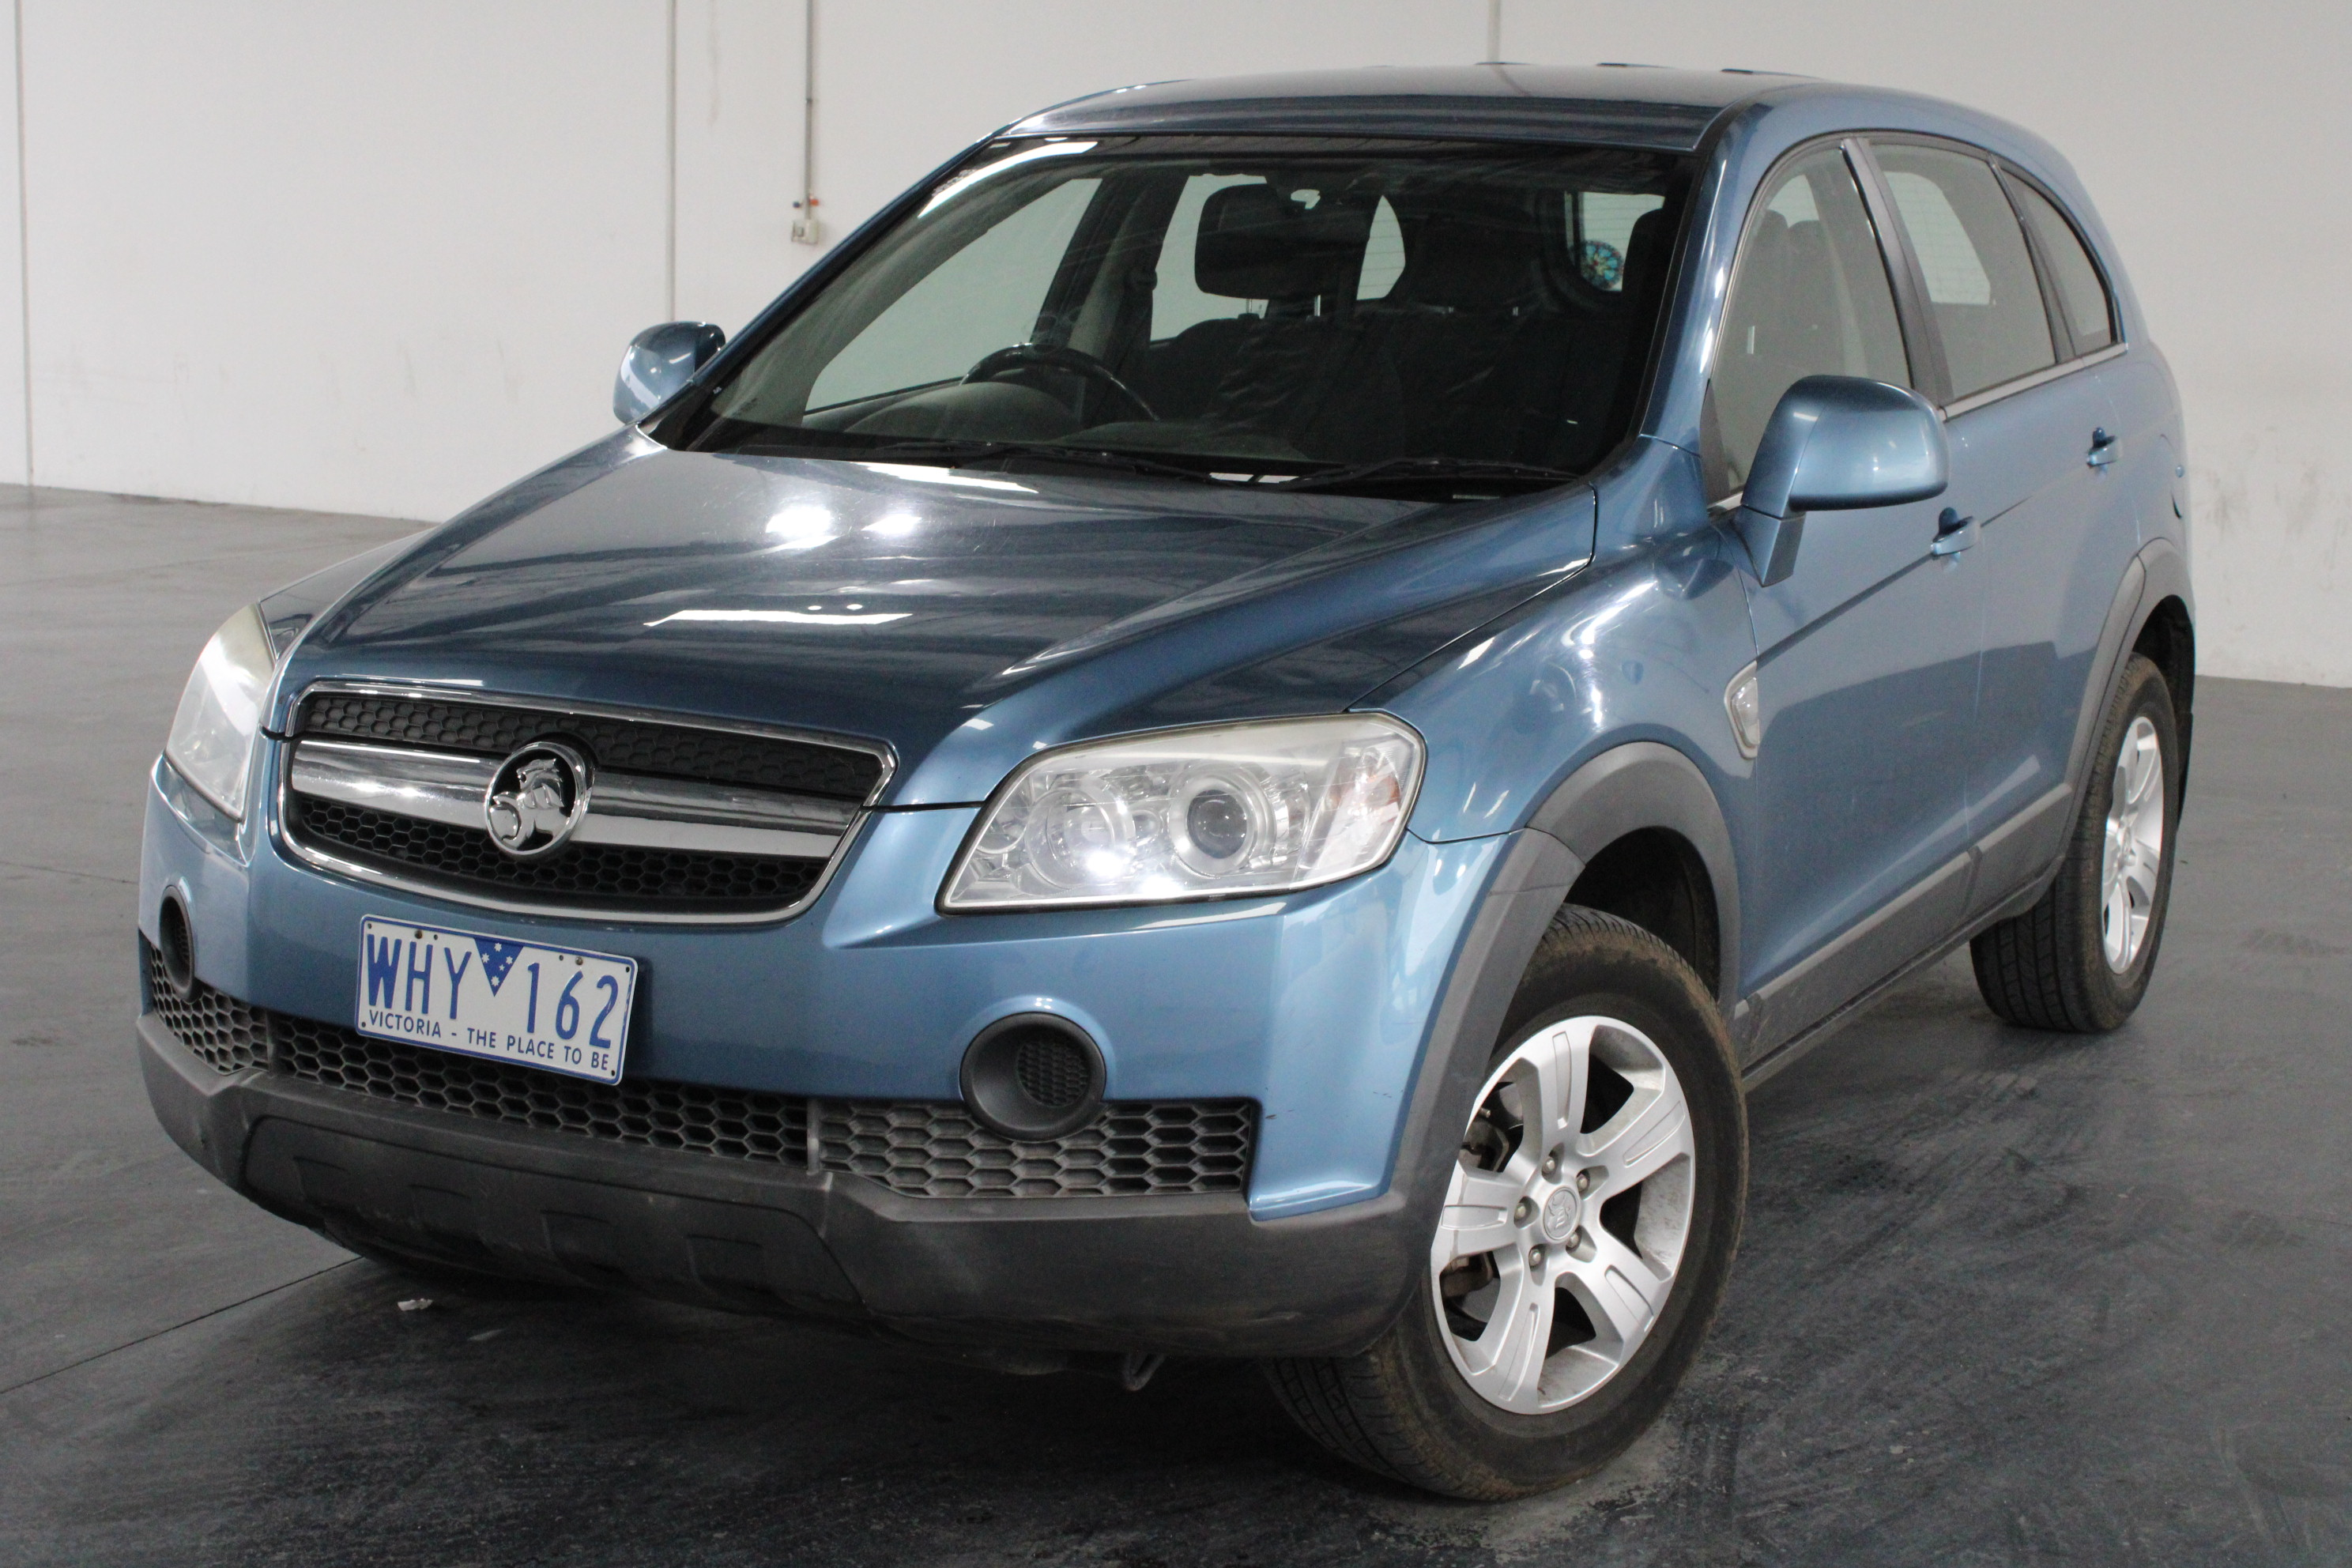 2008 Holden Captiva SX (4x4) CG Turbo Diesel Automatic Wagon